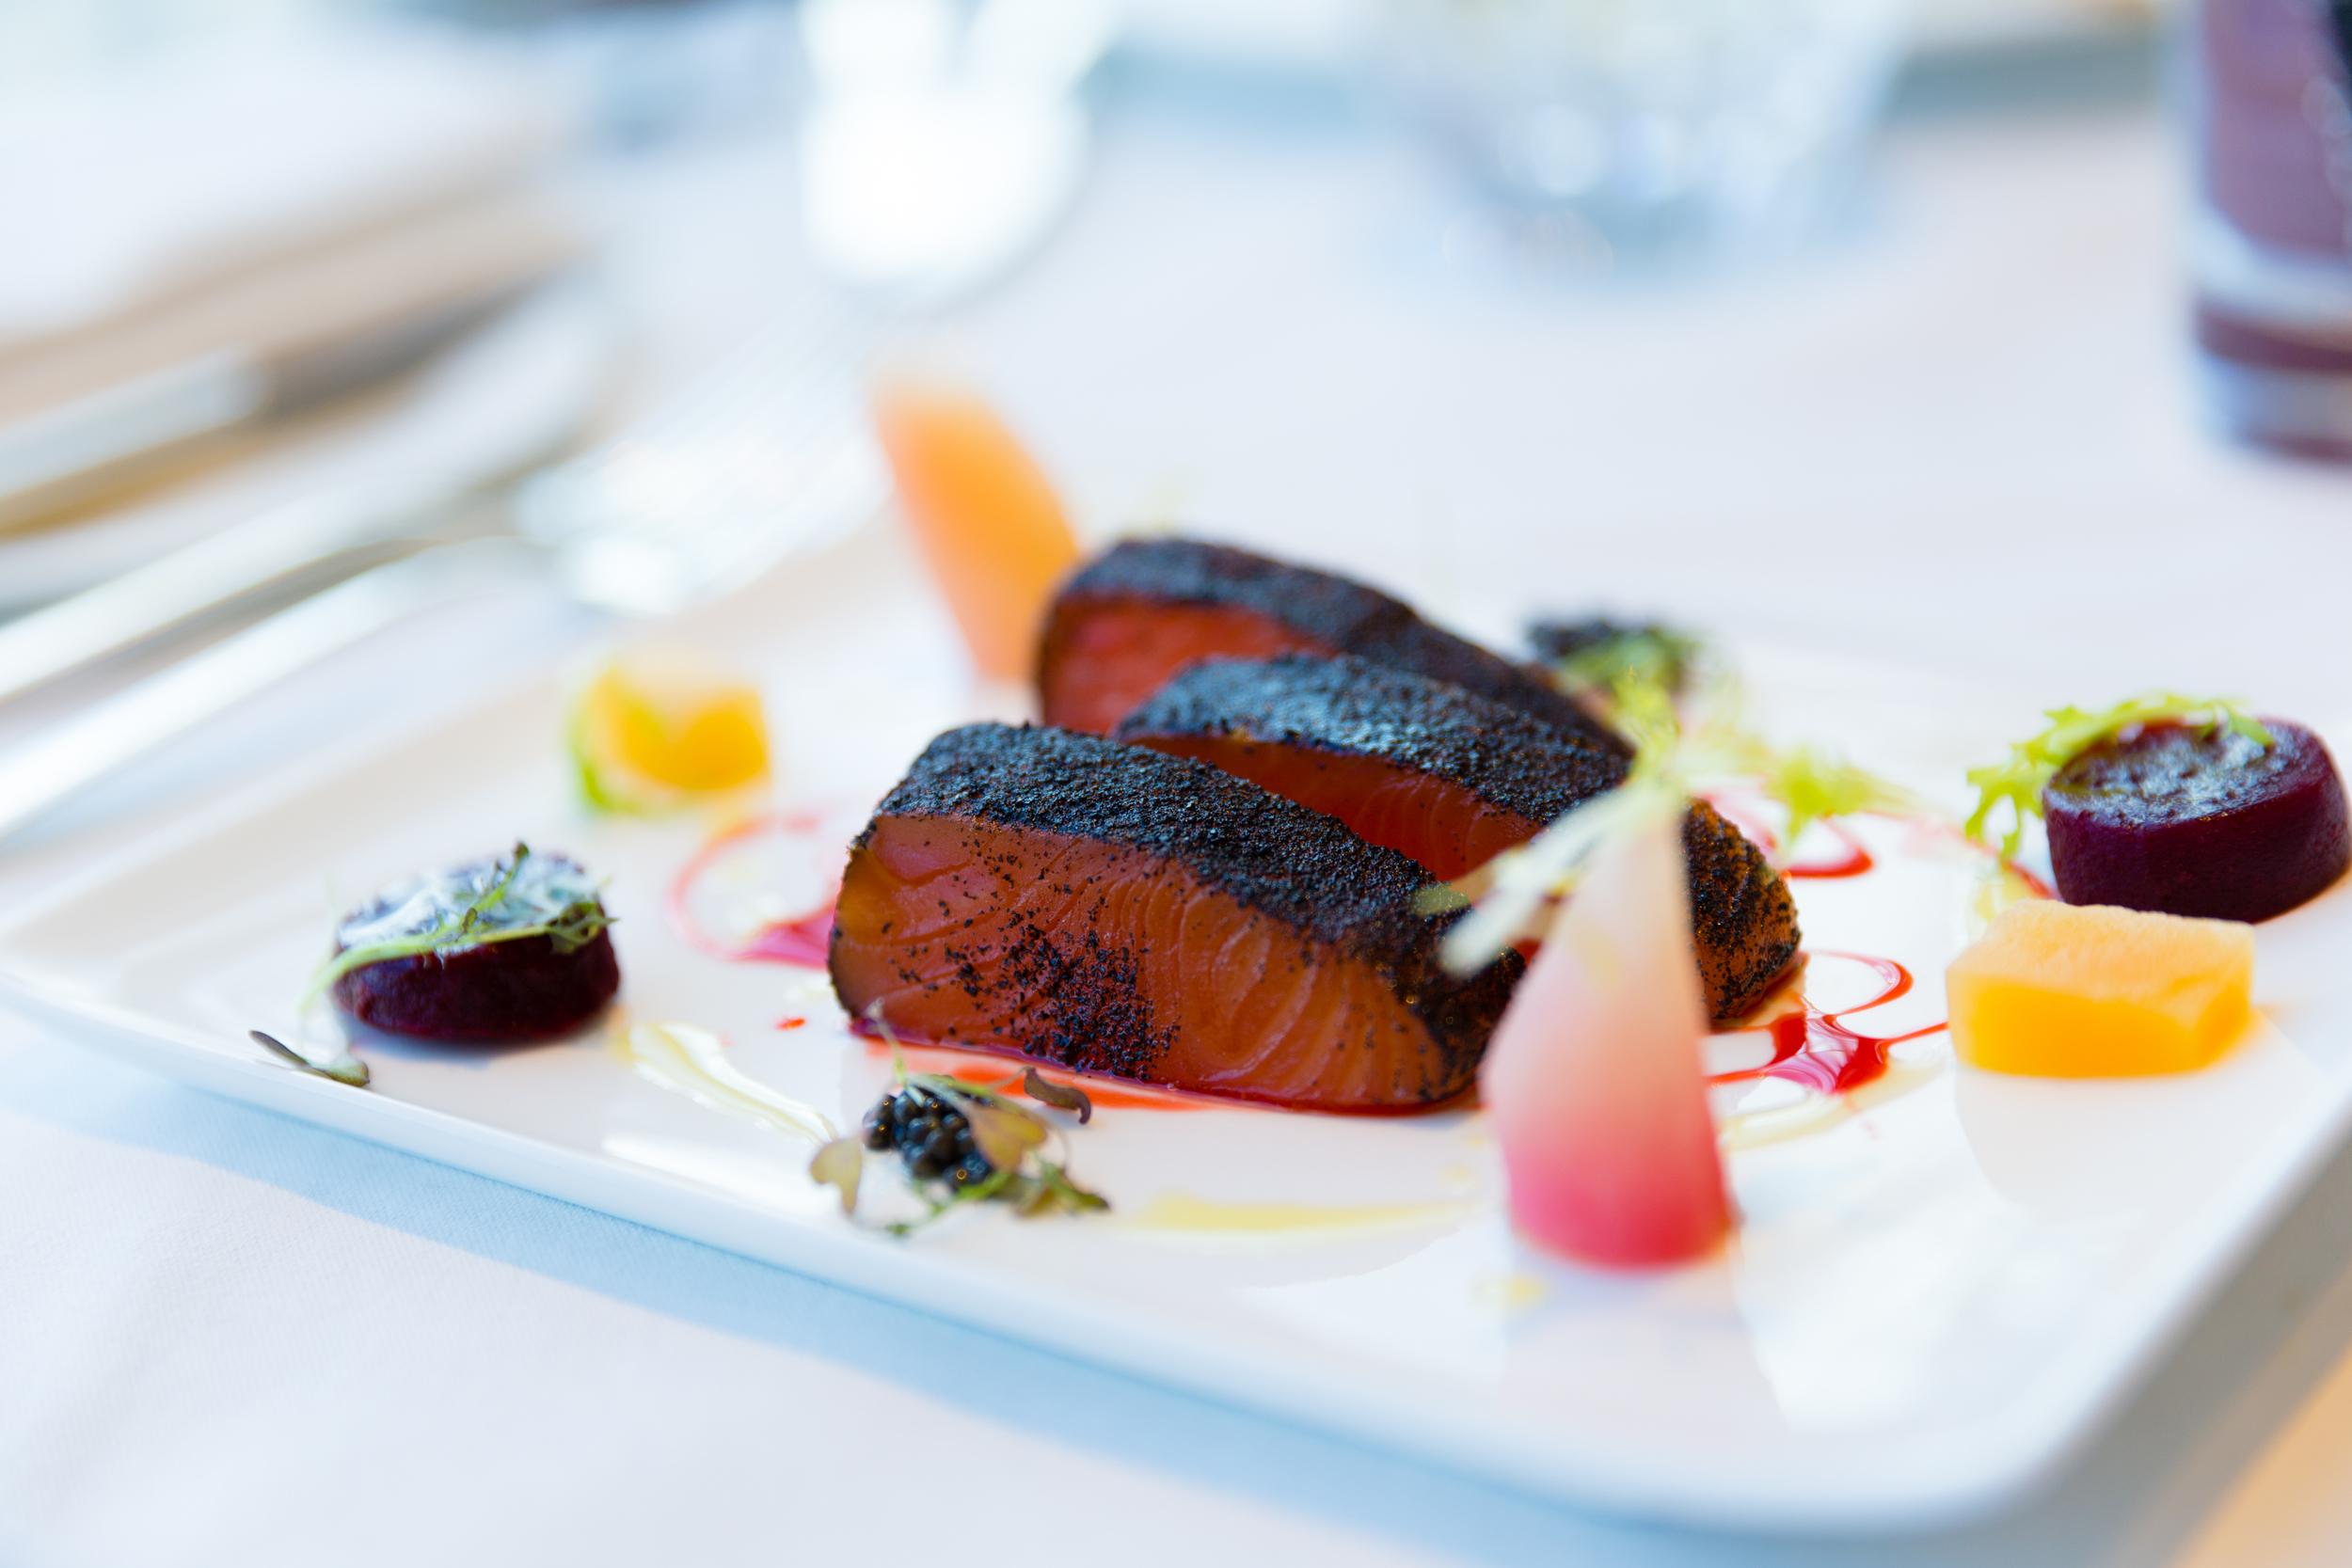 London Smoked Salmon Royal - Heritage beetroot, English Caviar, Lapsang Souchong tea